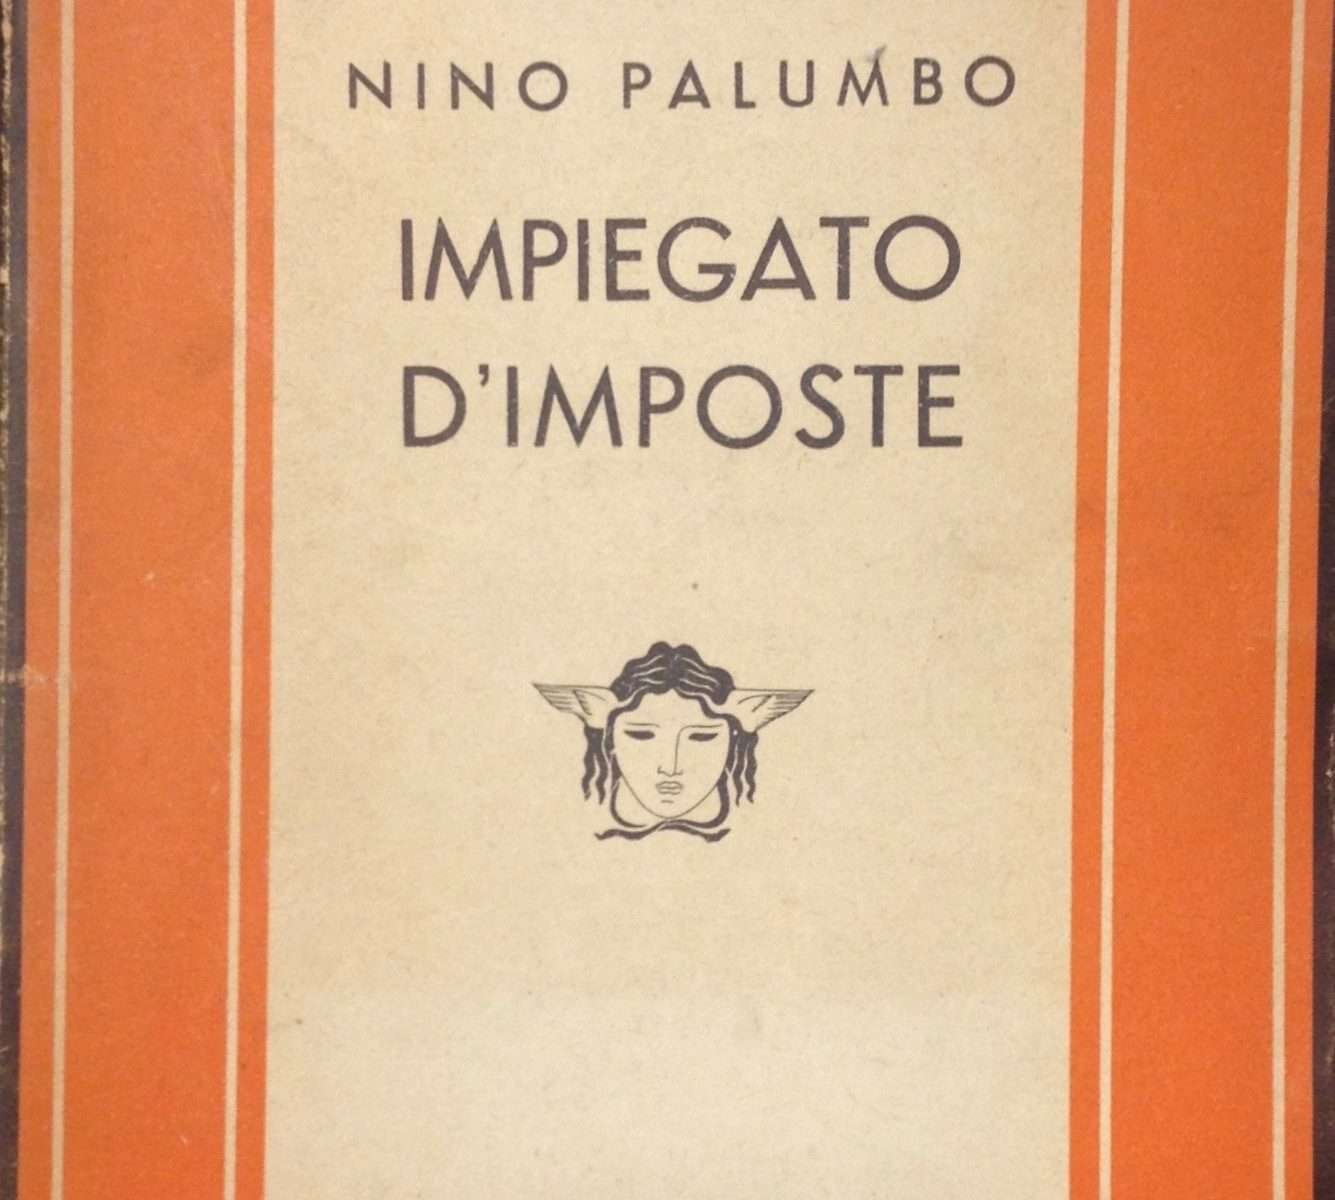 IMPIEGATO D'IMPOSTE  <BR/> Nino Palumbo